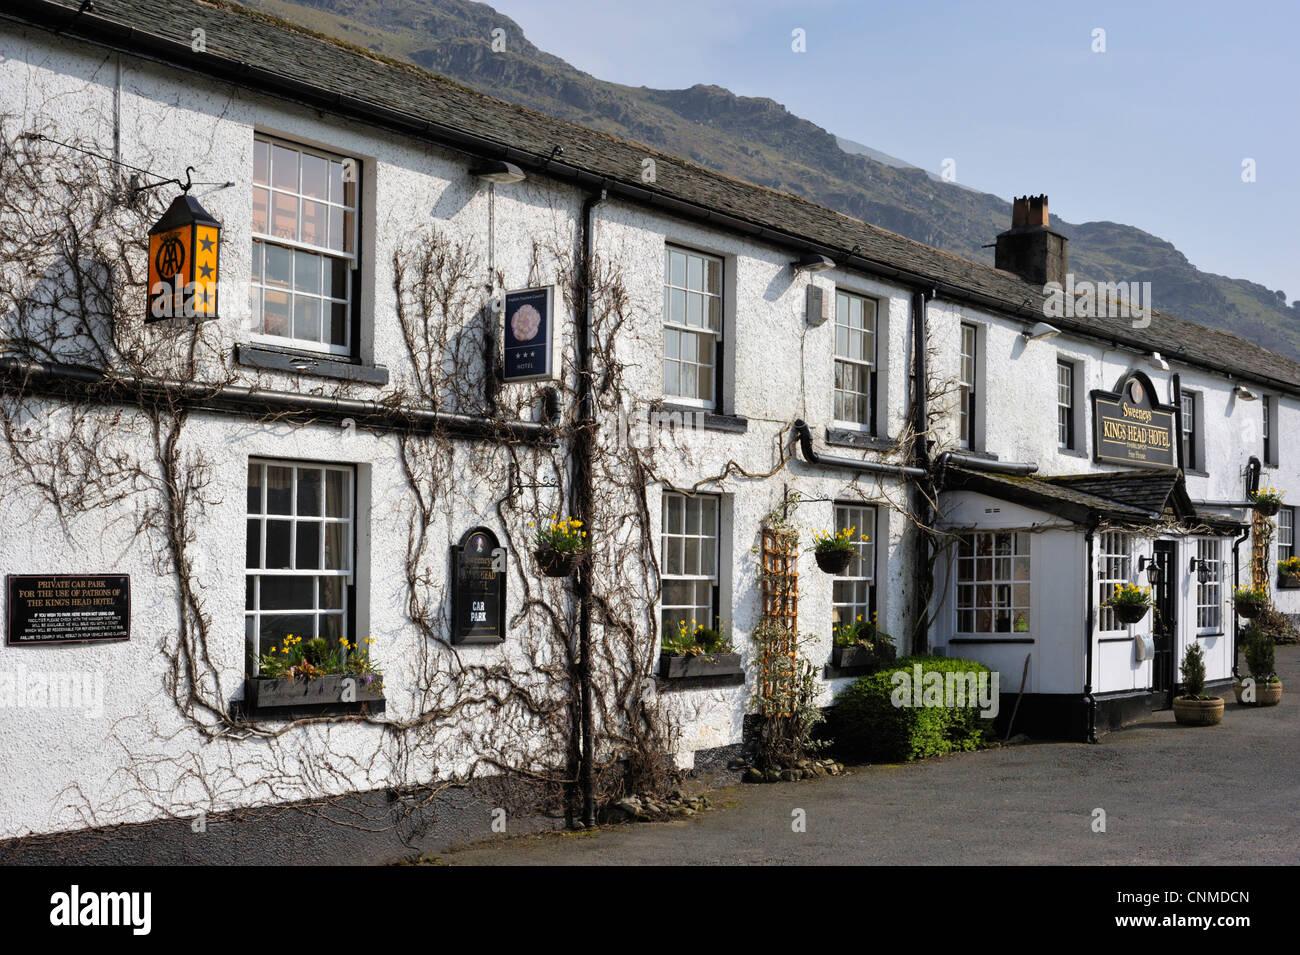 kings-head-hotel-thirlspot-lake-district-national-park-cumbria-england-CNMDCN.jpg